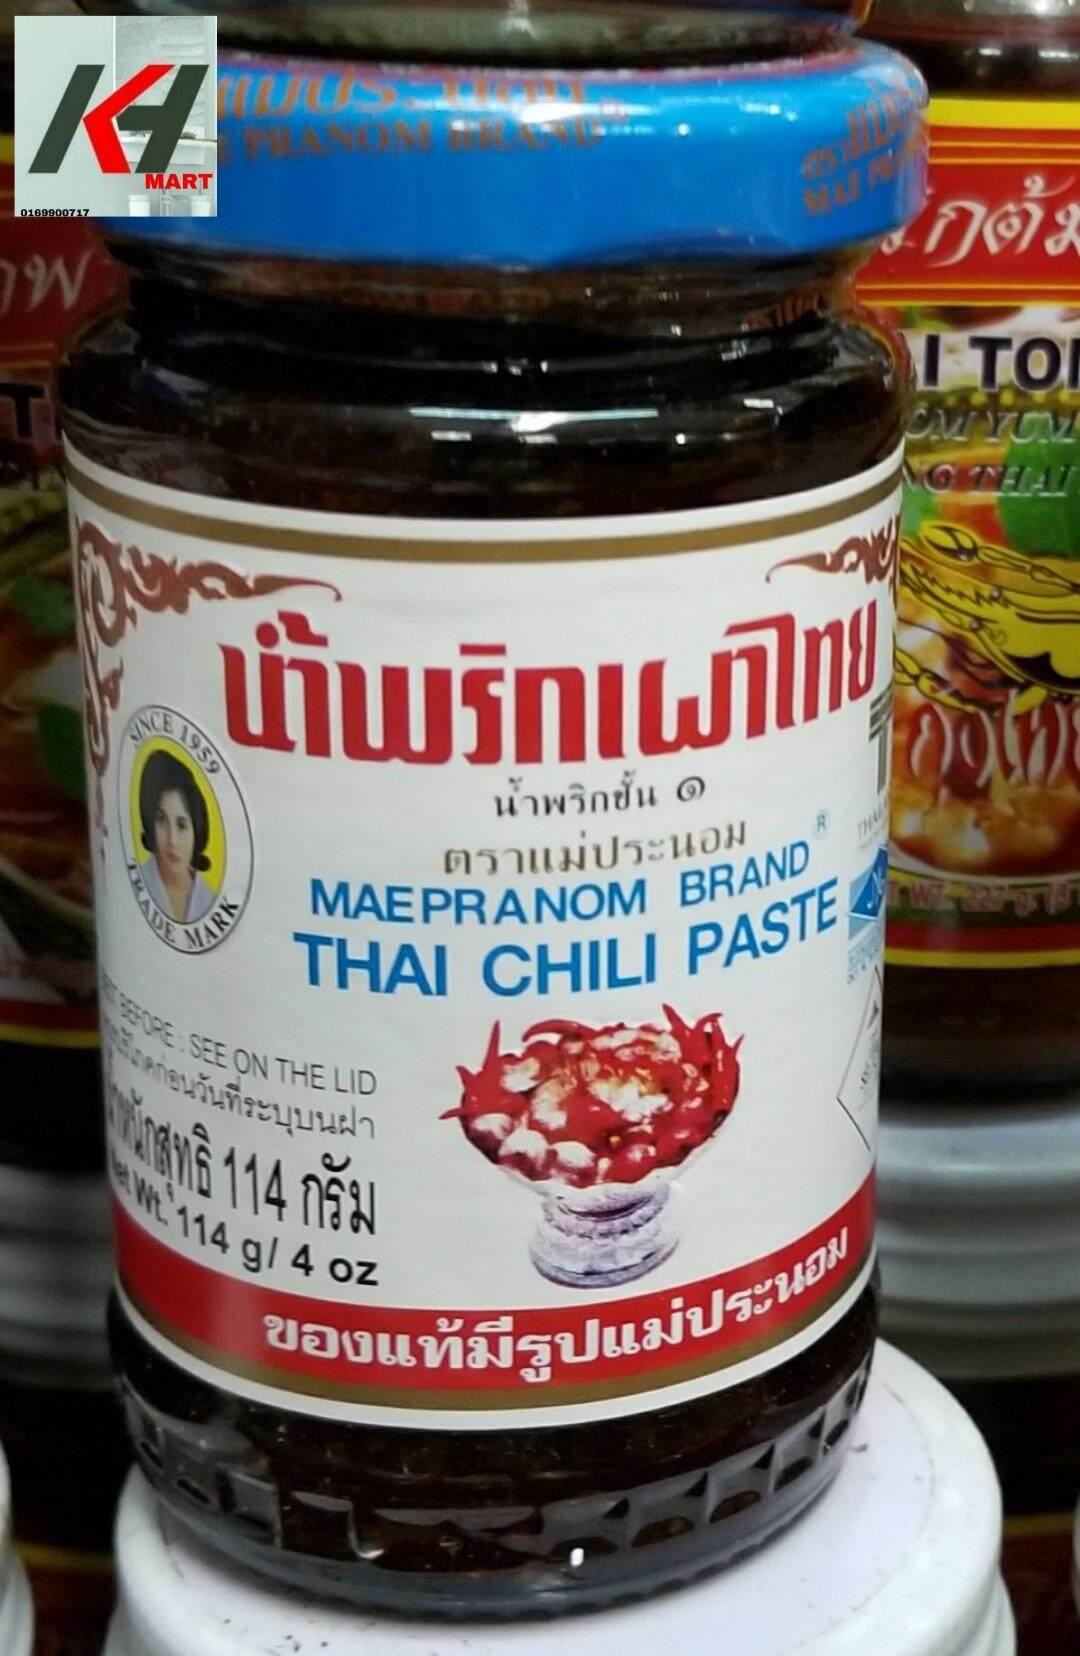 MAEPRANOM BRAND THAI CHILI PASTE 114G